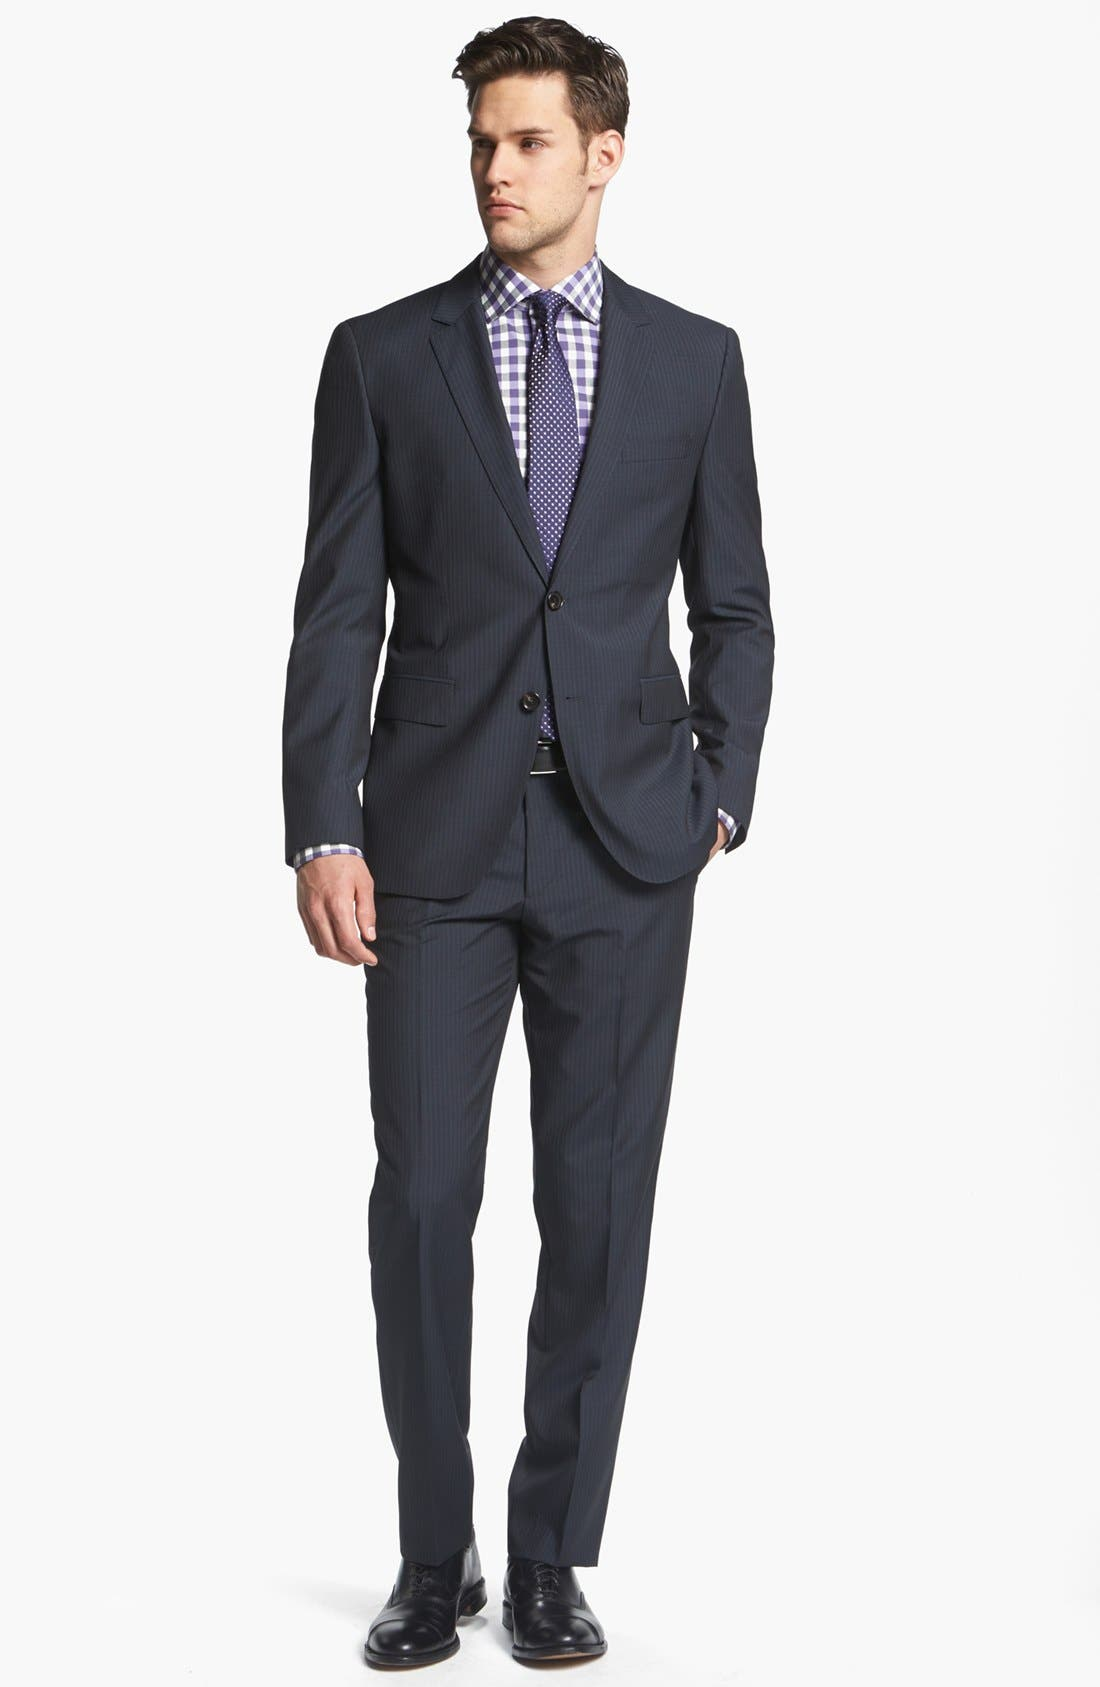 Main Image - BOSS Black Suit & Calibrate Dress Shirt